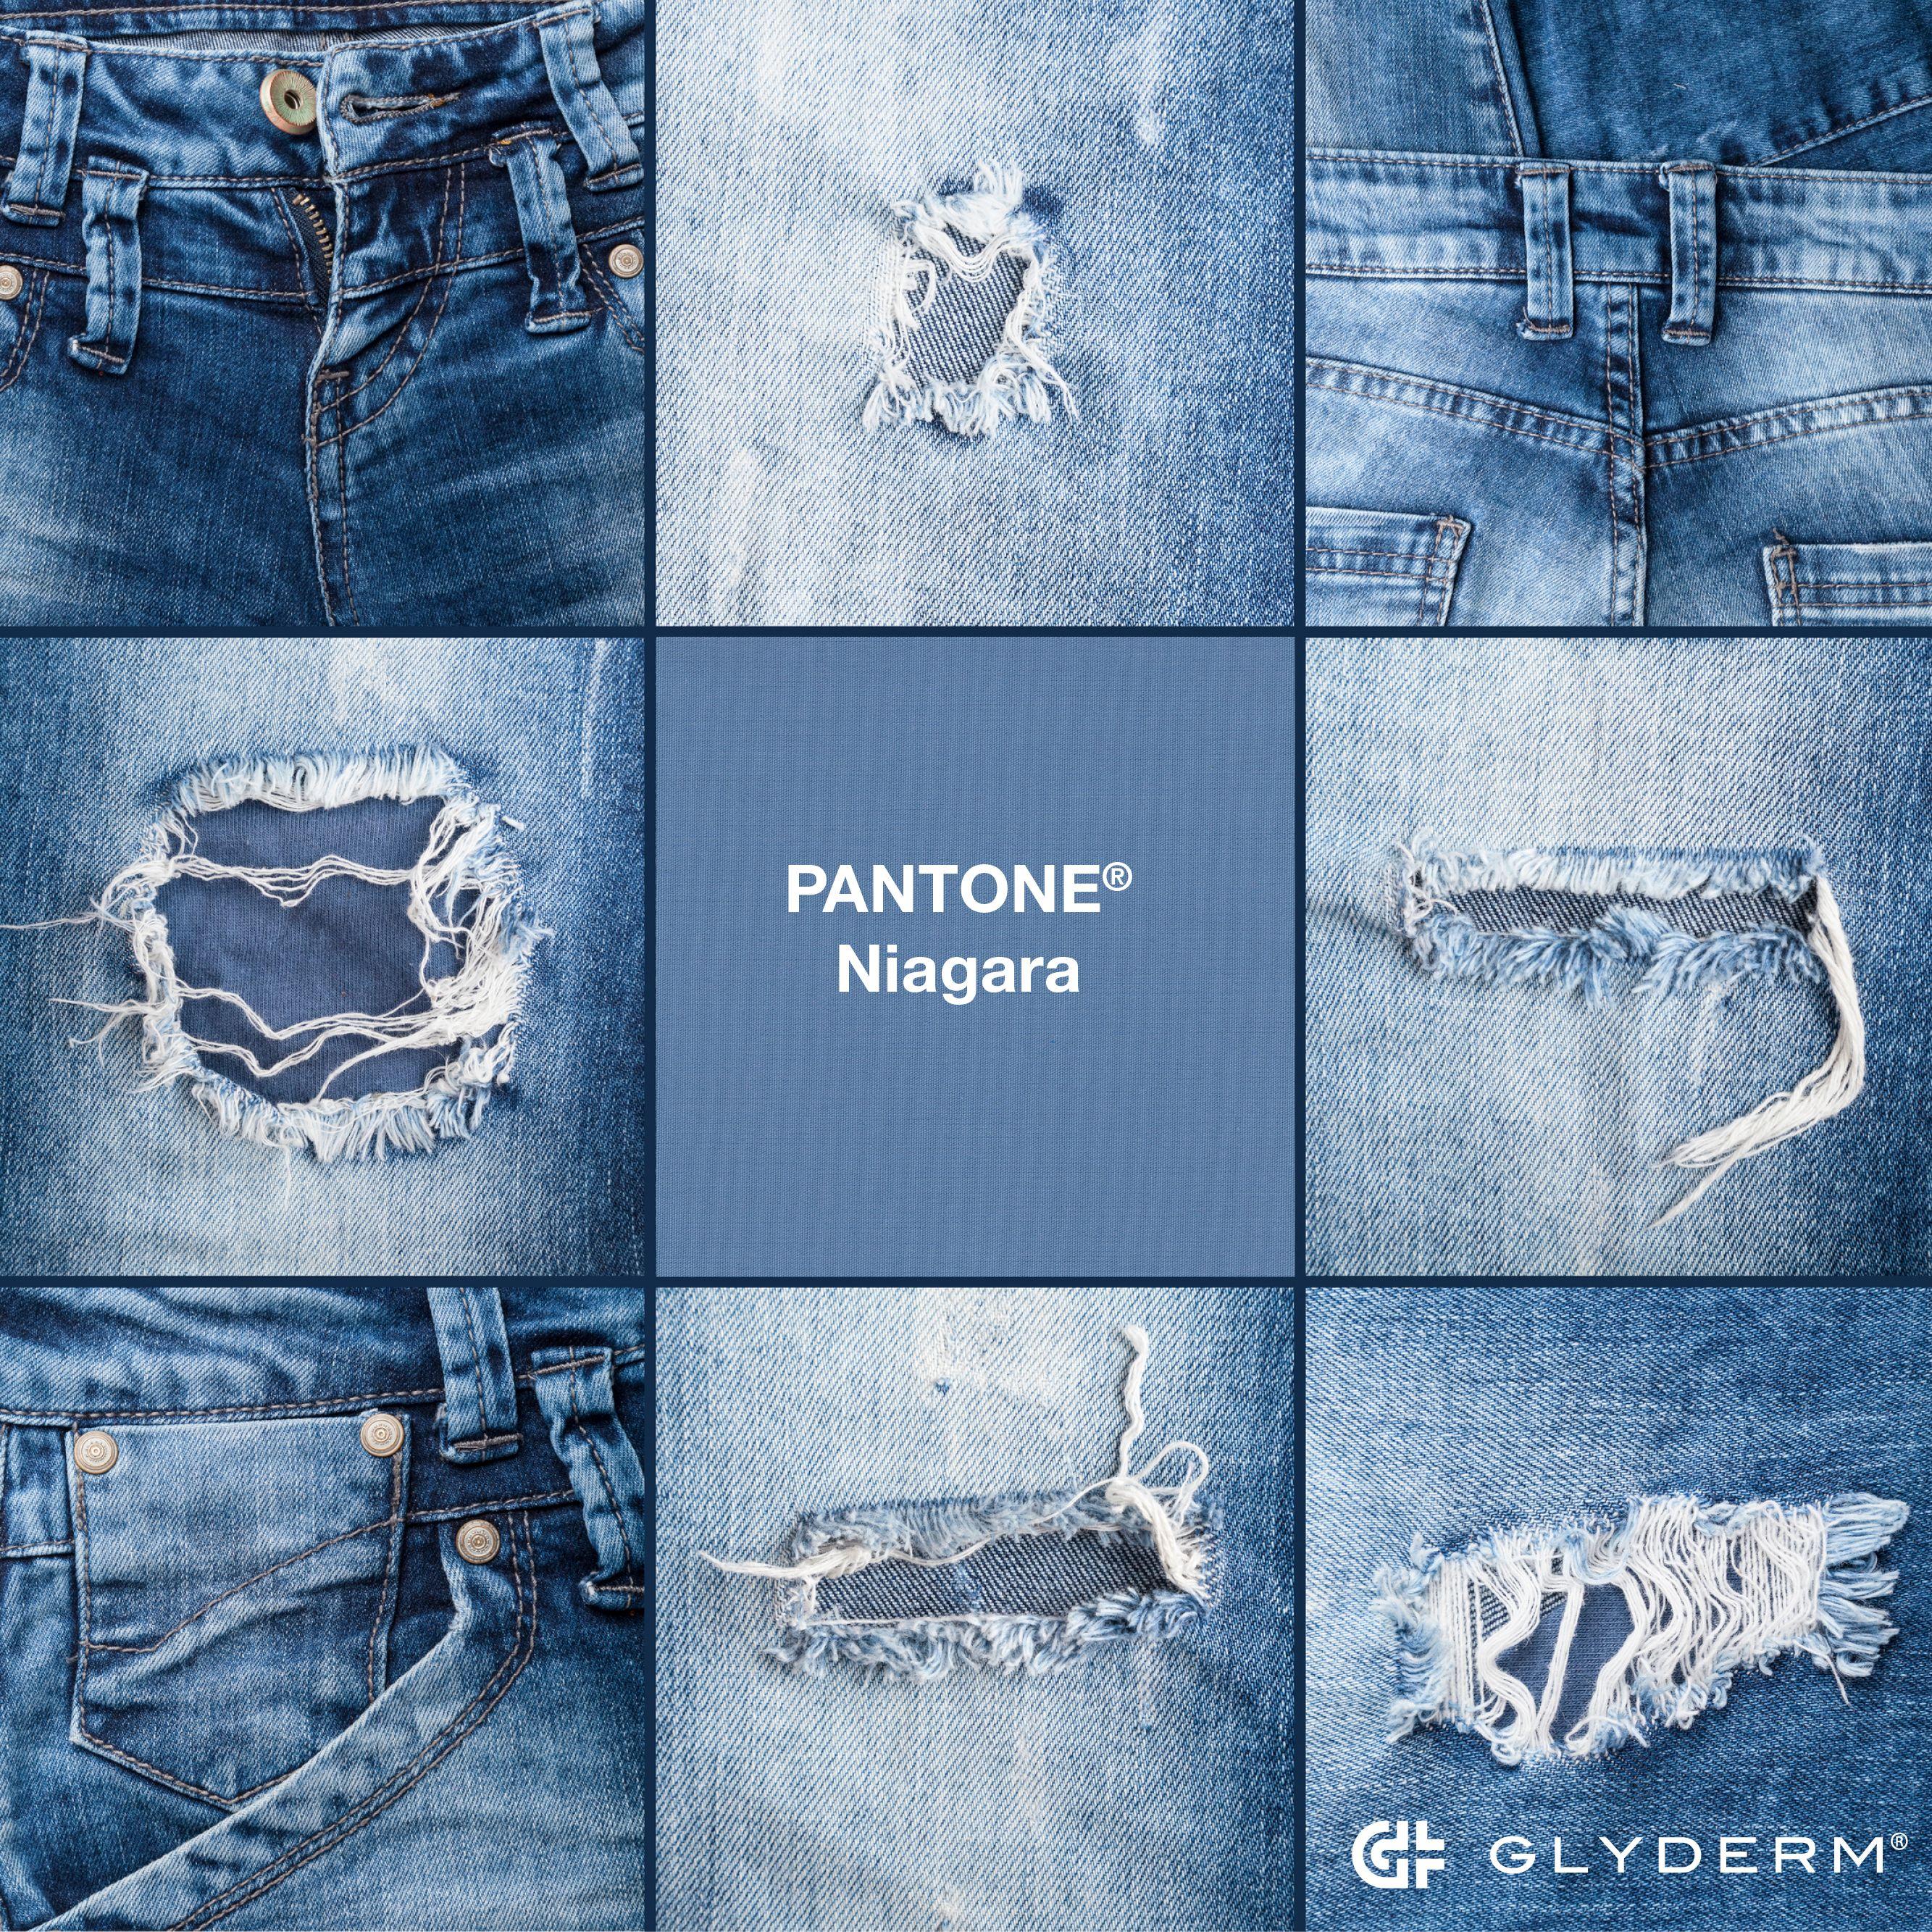 The Pantone Color Niagara A Classic Denim Like Blue That